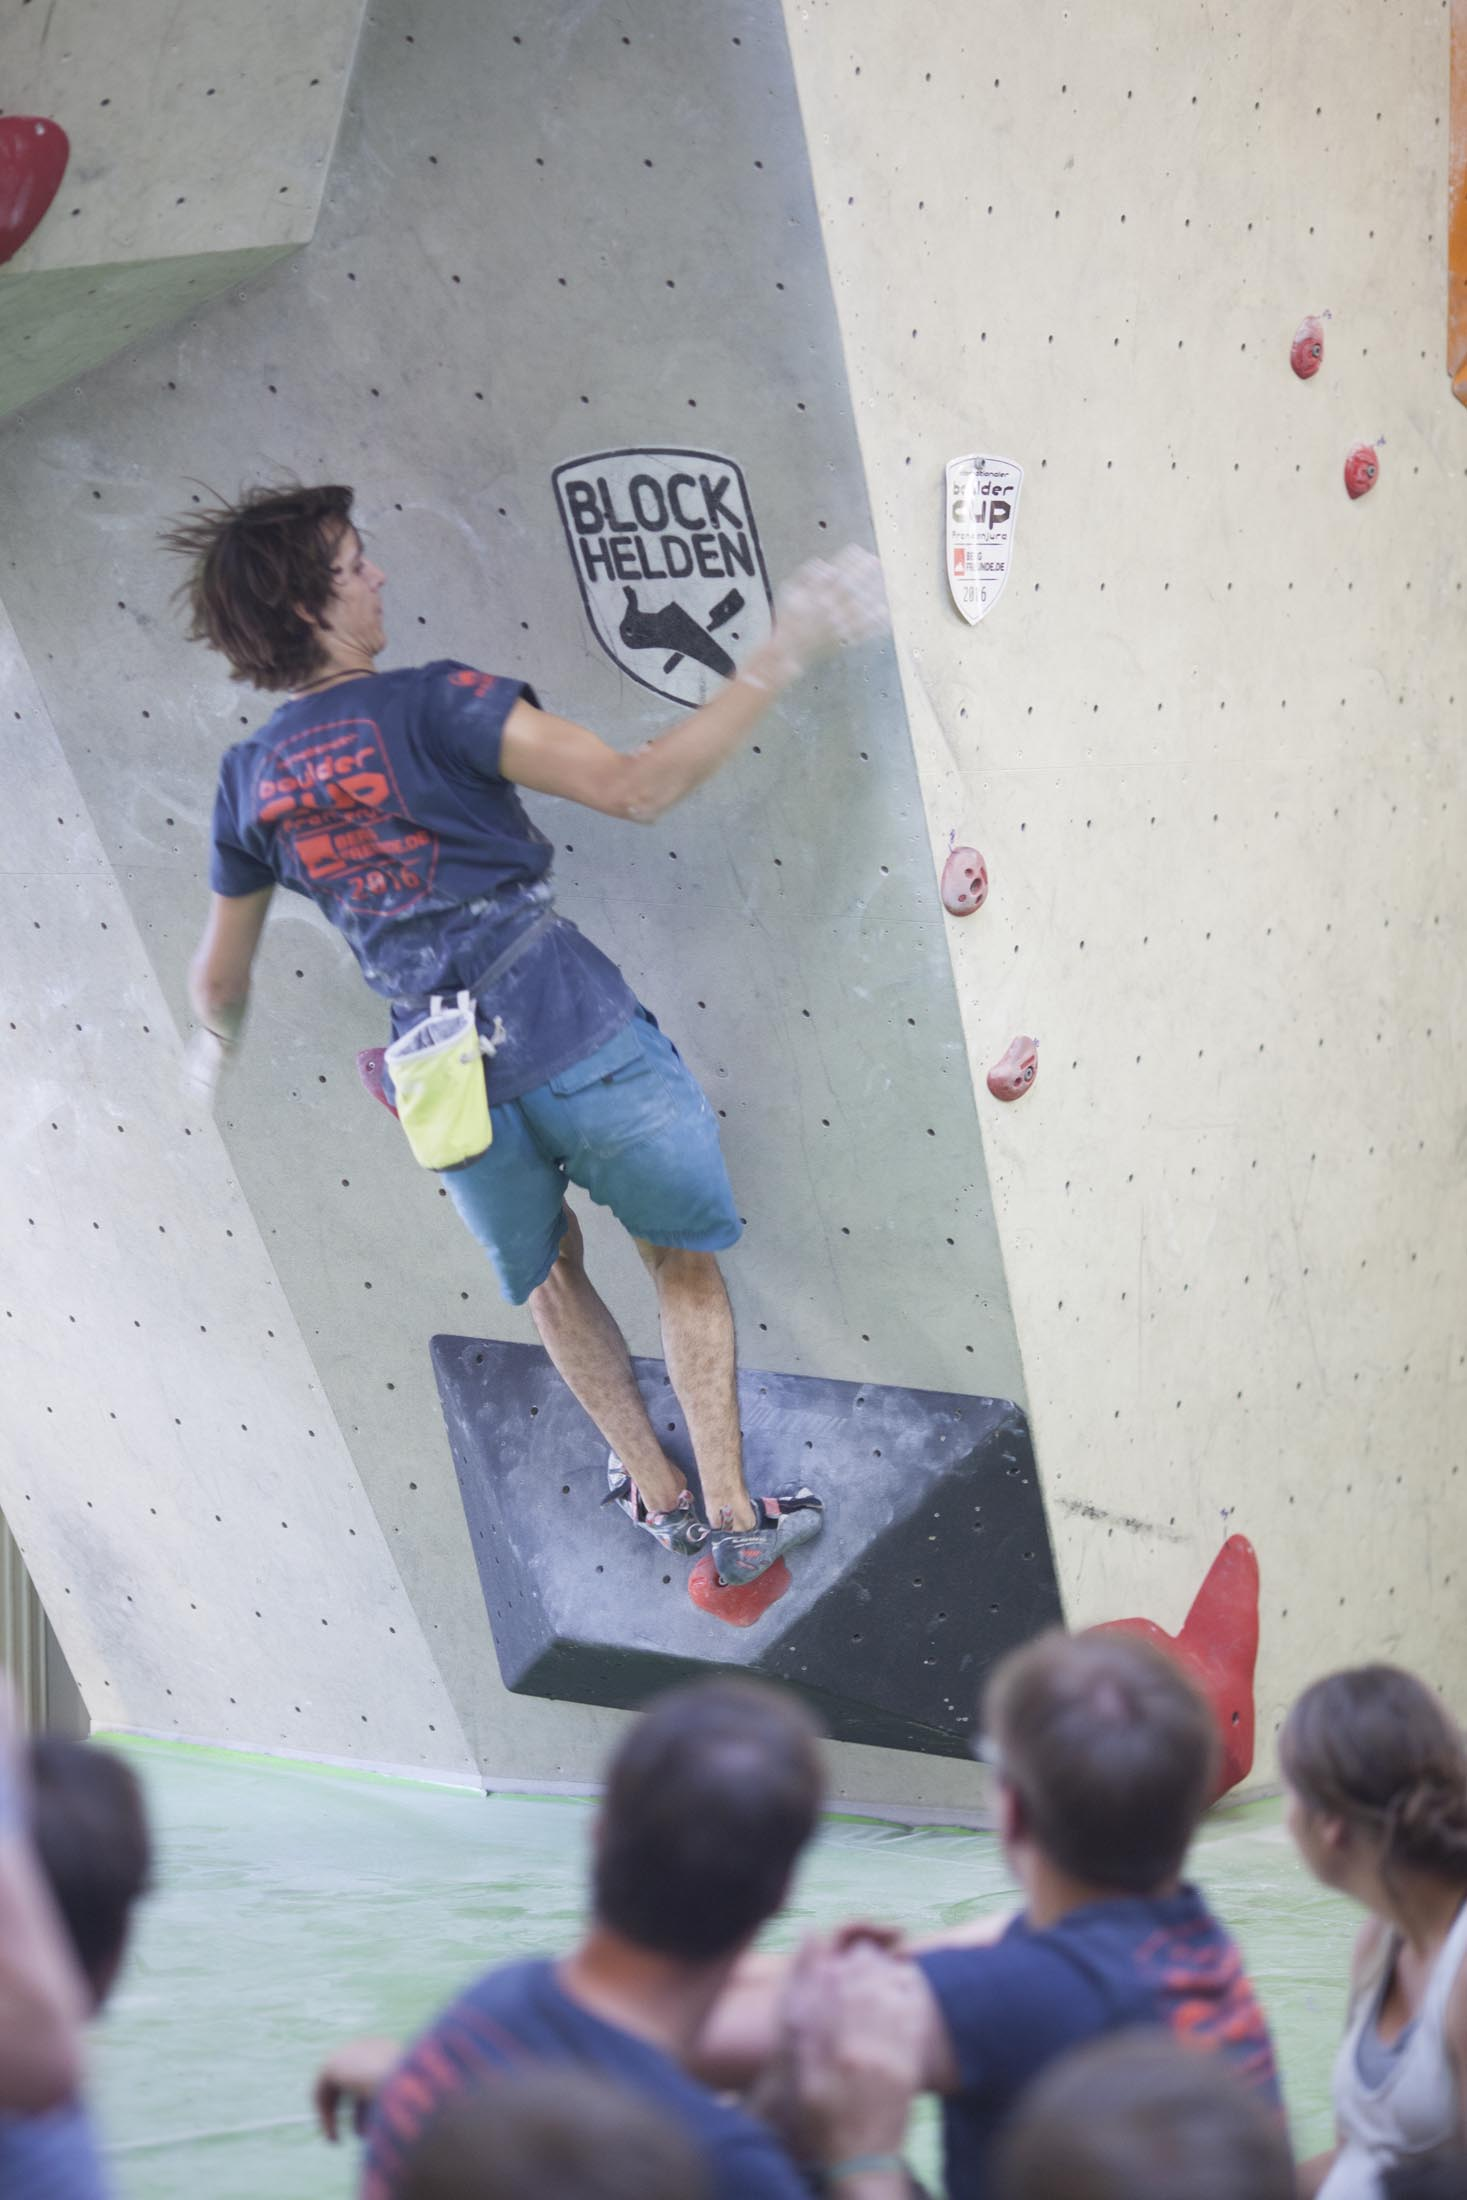 Finale, internationaler bouldercup Frankenjura 2016, BLOCKHELDEN Erlangen, Mammut, Bergfreunde.de, Boulderwettkampf07092016626